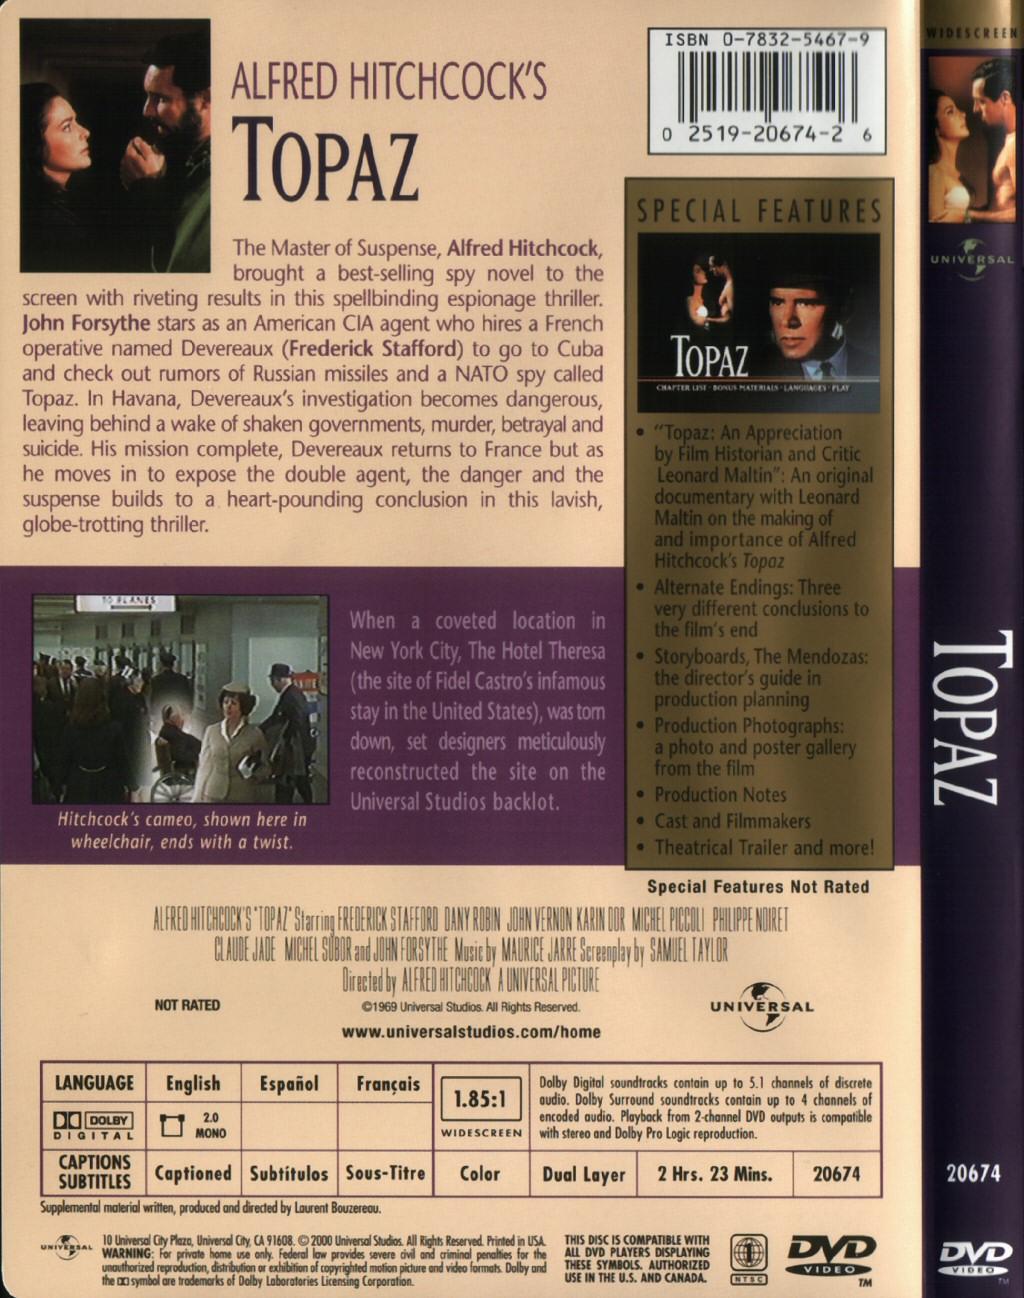 Topaz (1969) - Universal (USA, 1999) - The Alfred Hitchcock Wiki